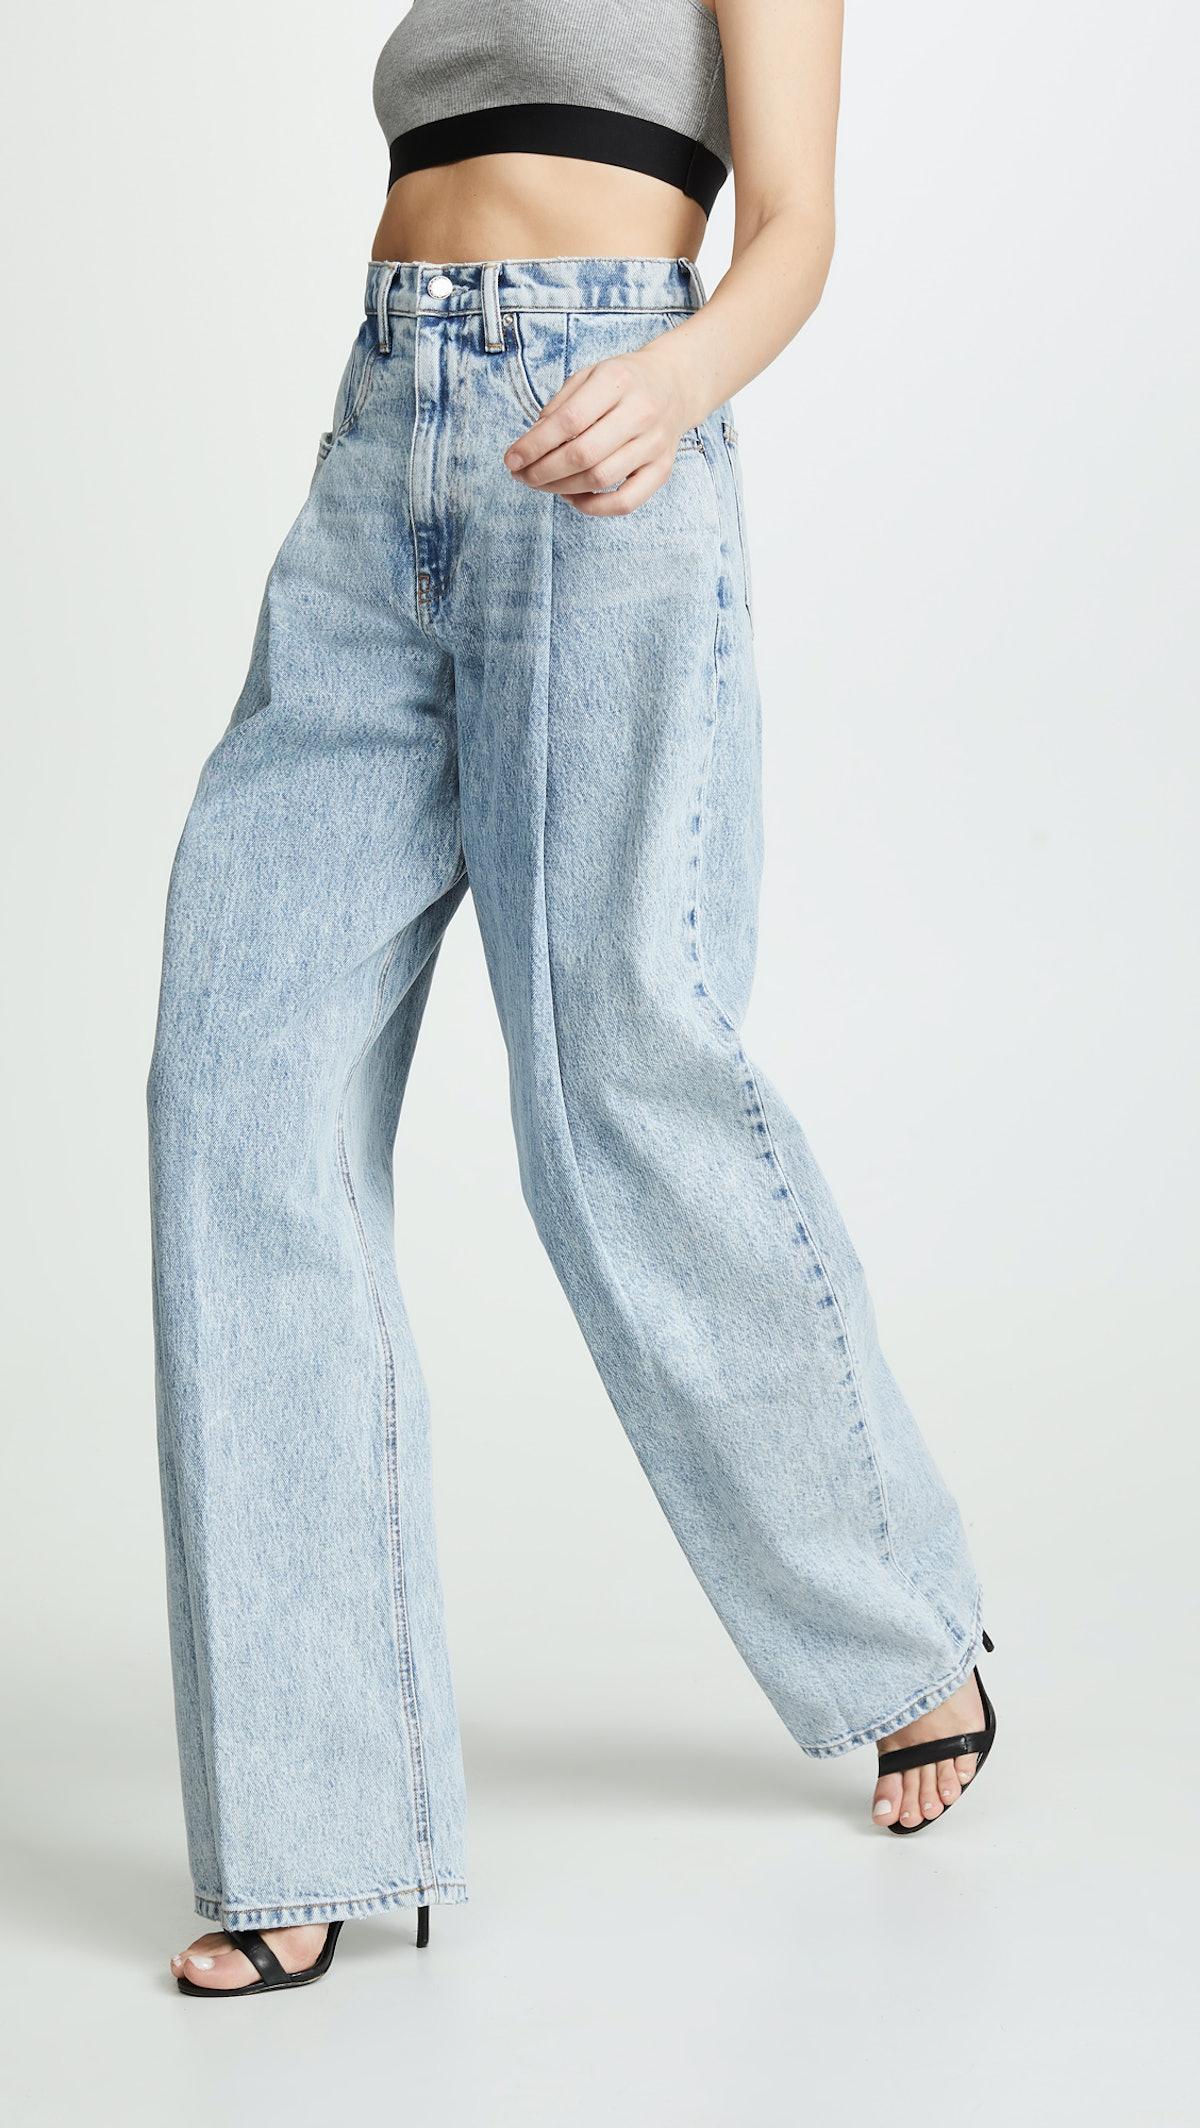 Brace Pleated Jeans